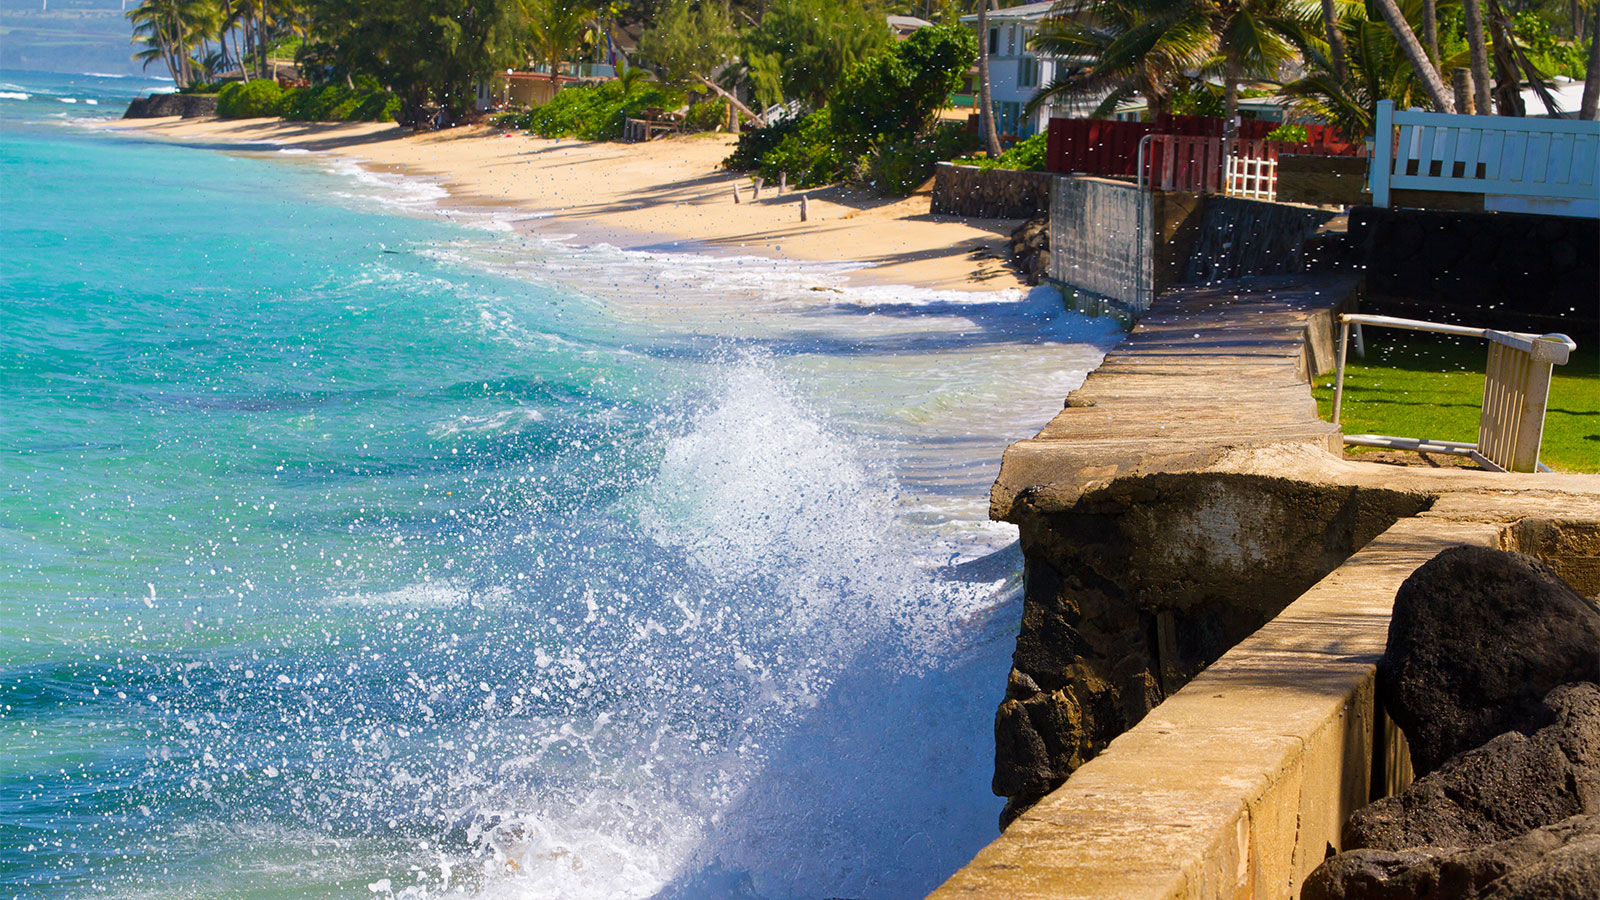 A wave crashing against a seawall in Hawai'i